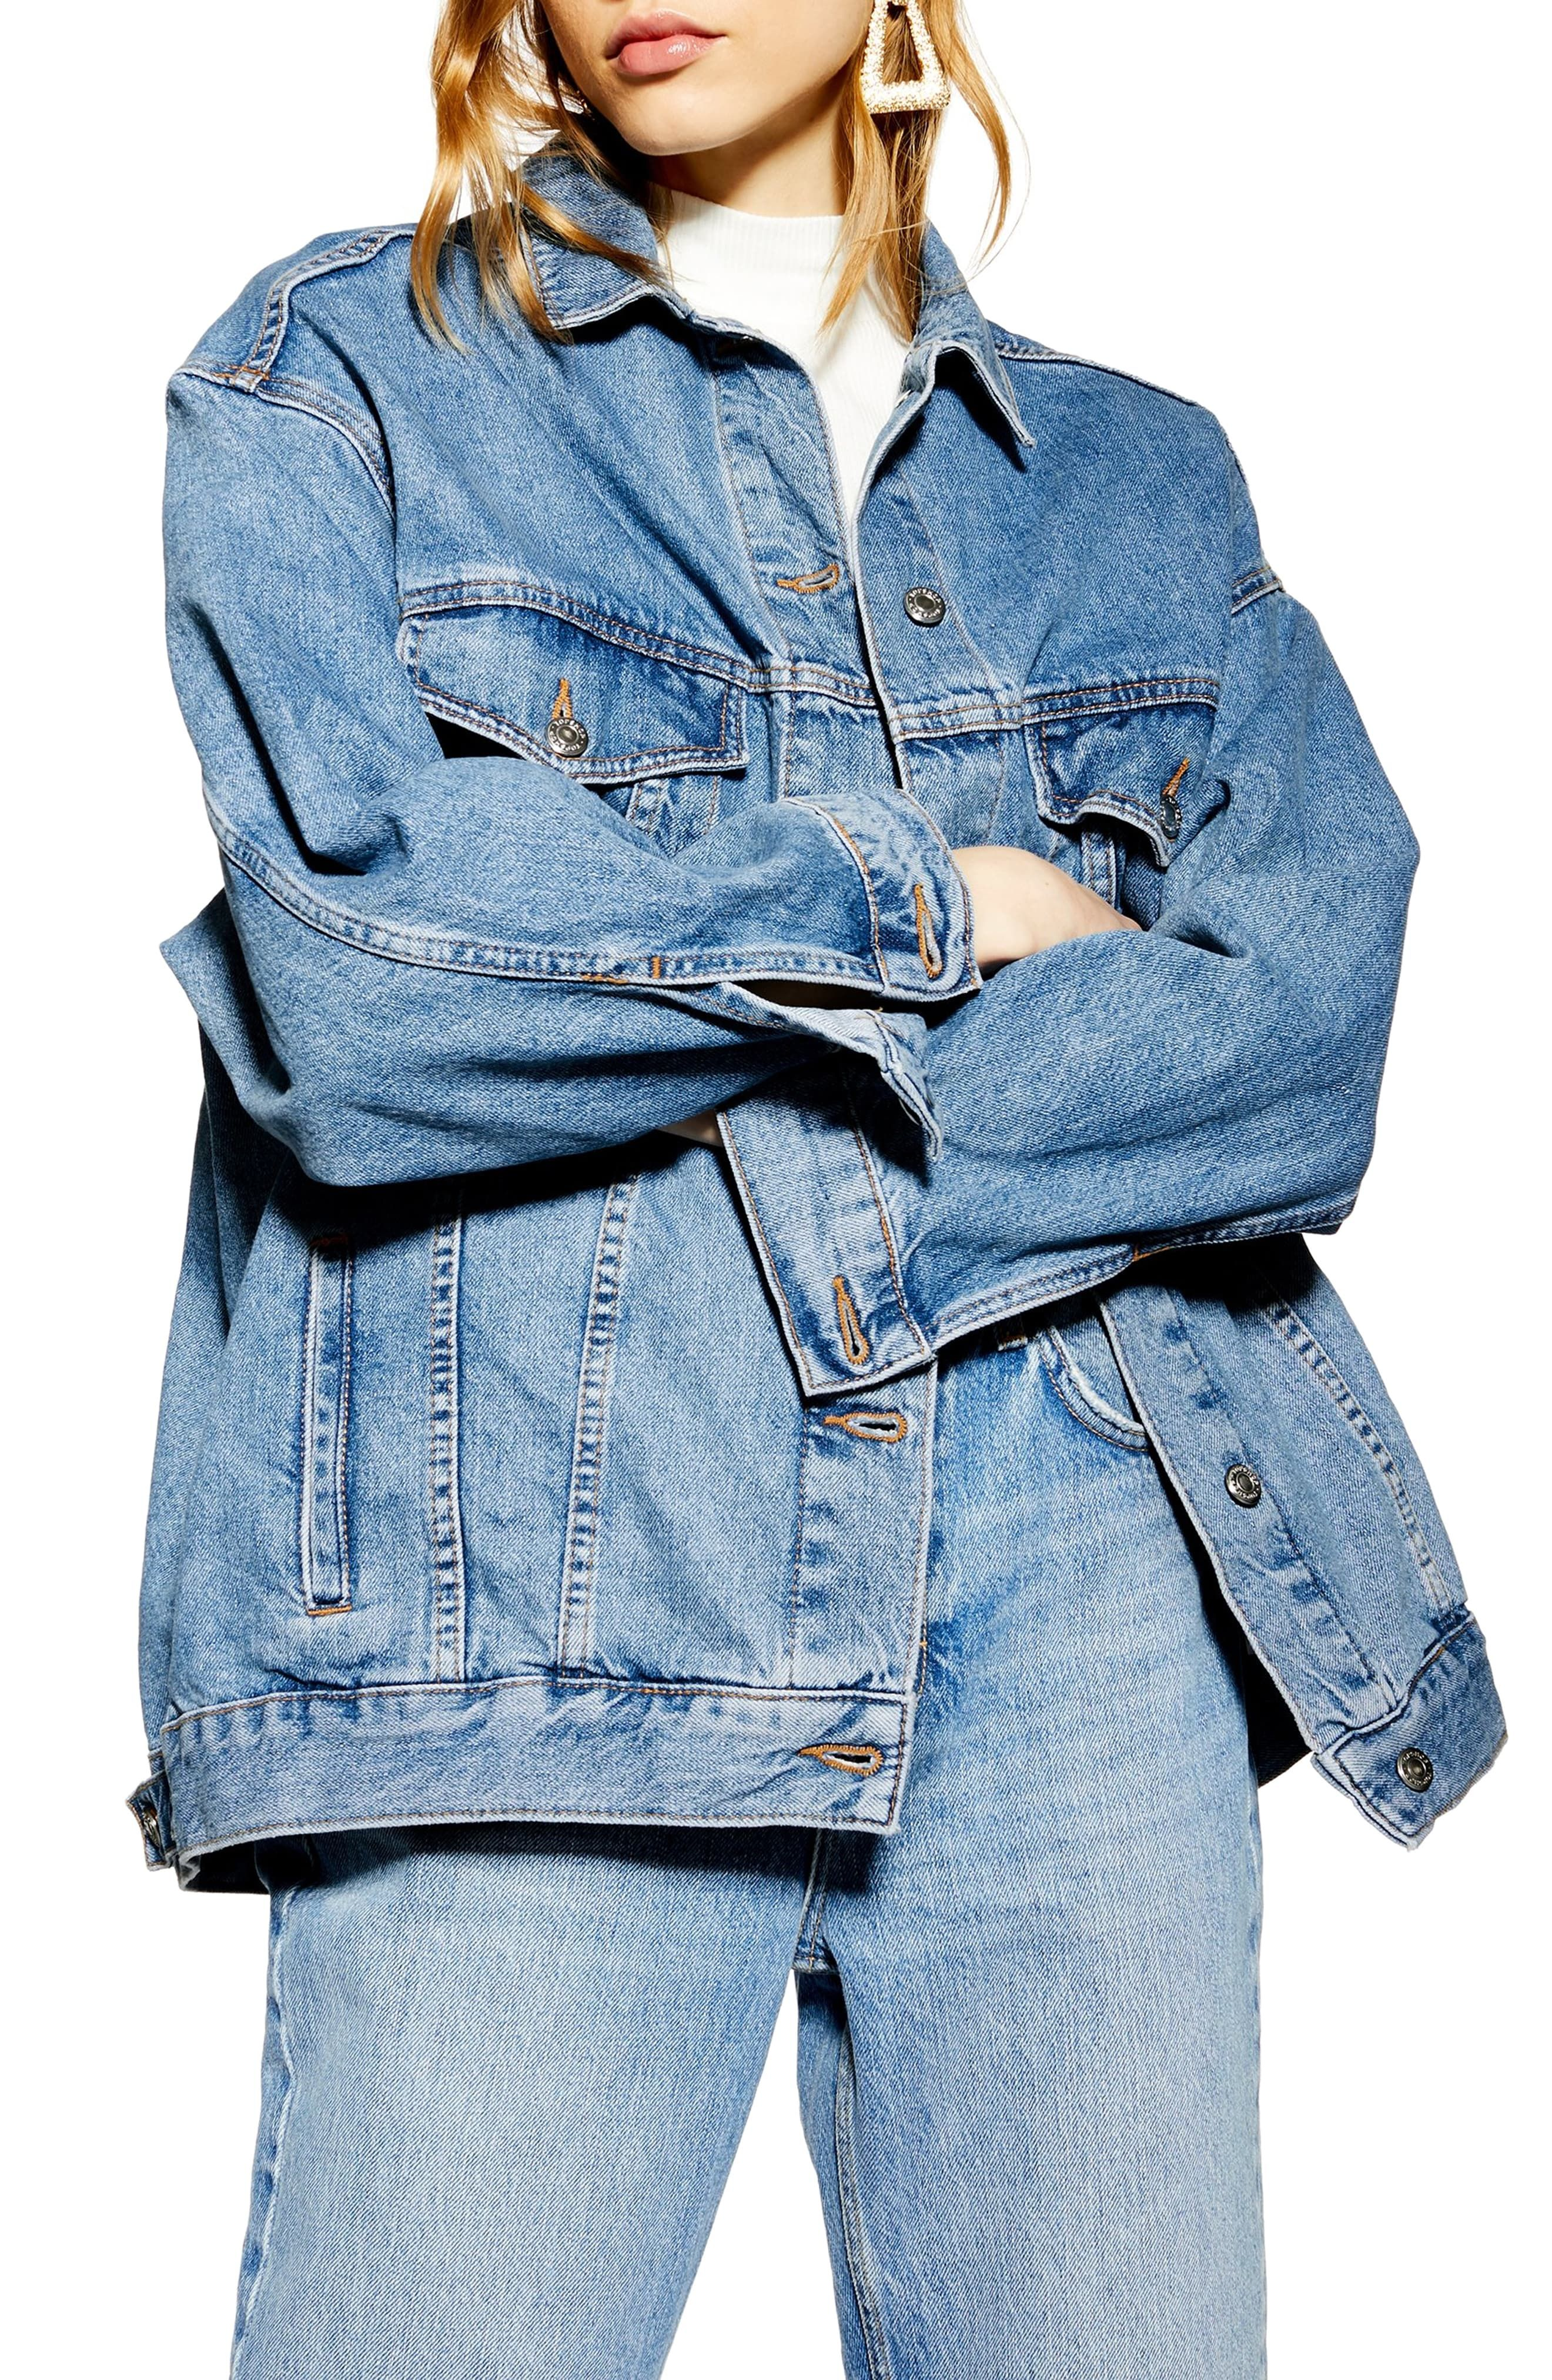 Women S Topshop Oversize Denim Jacket Size 12 Us Fits Like 14 Blue Oversized Denim Jacket Denim Jacket Women Jean Jacket Outfits [ 4048 x 2640 Pixel ]